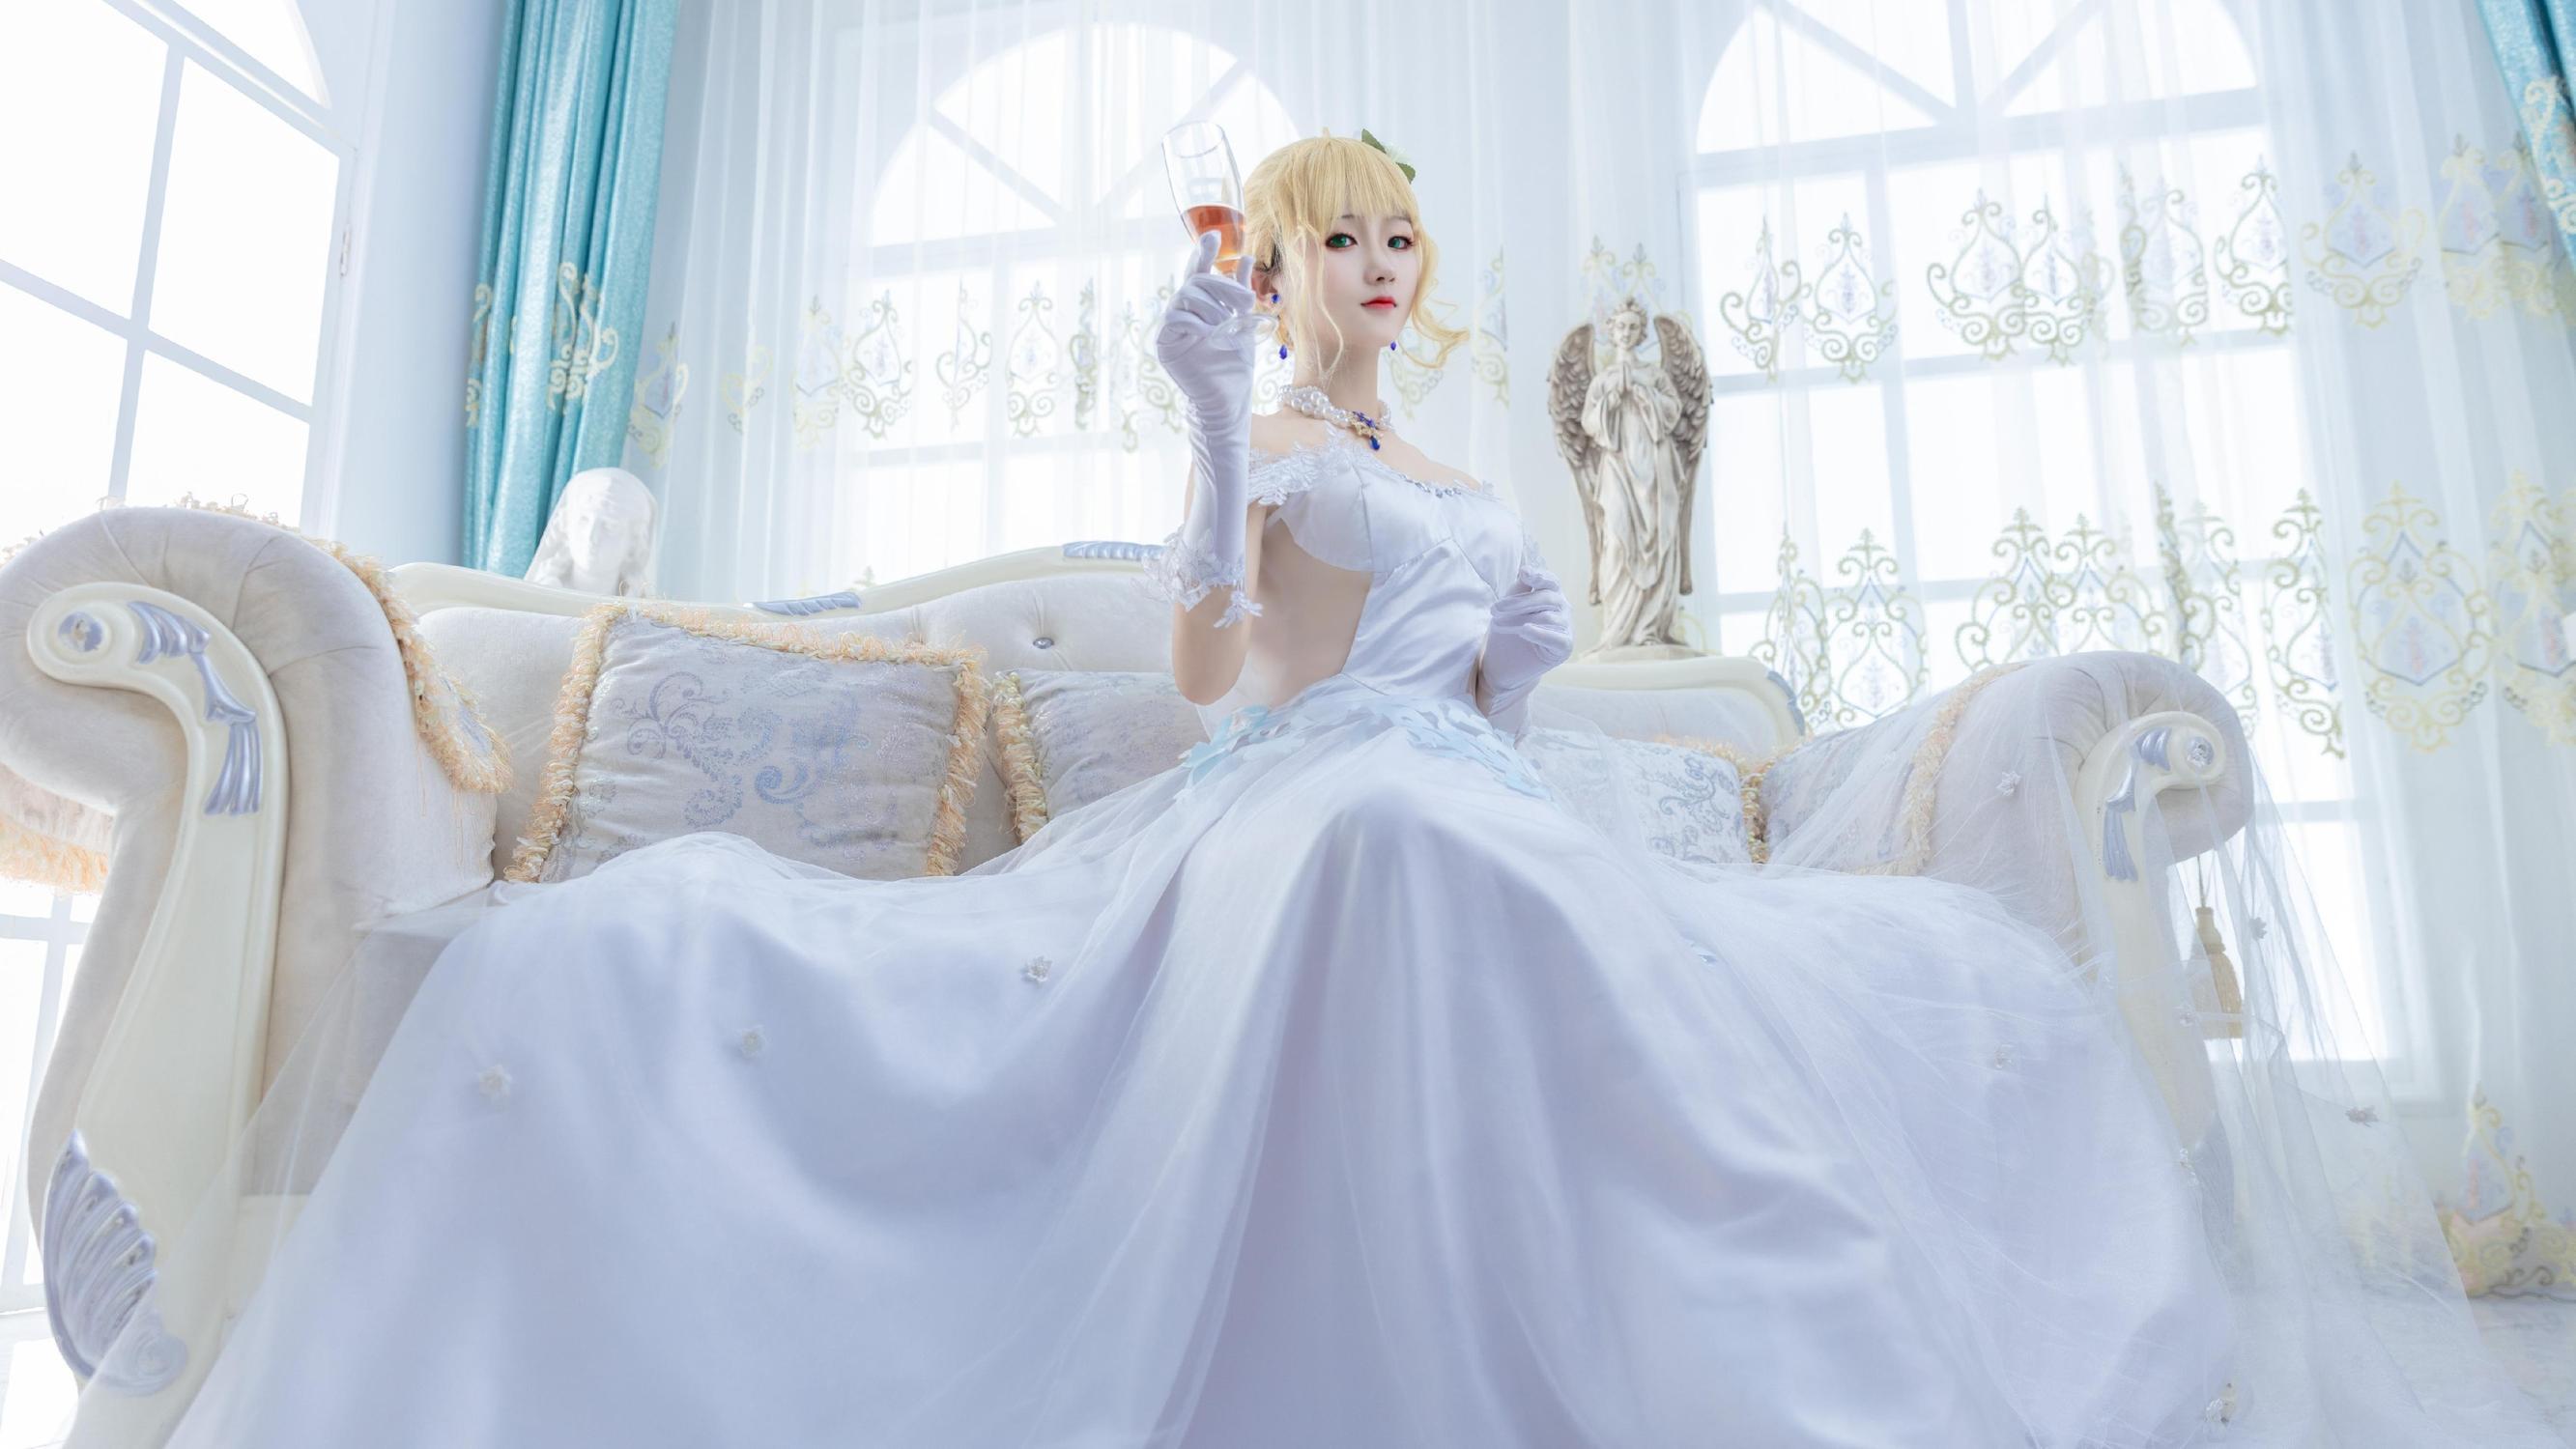 《FATE/GRAND ORDER》挑战cosplay【CN:沉了个沉】-第8张